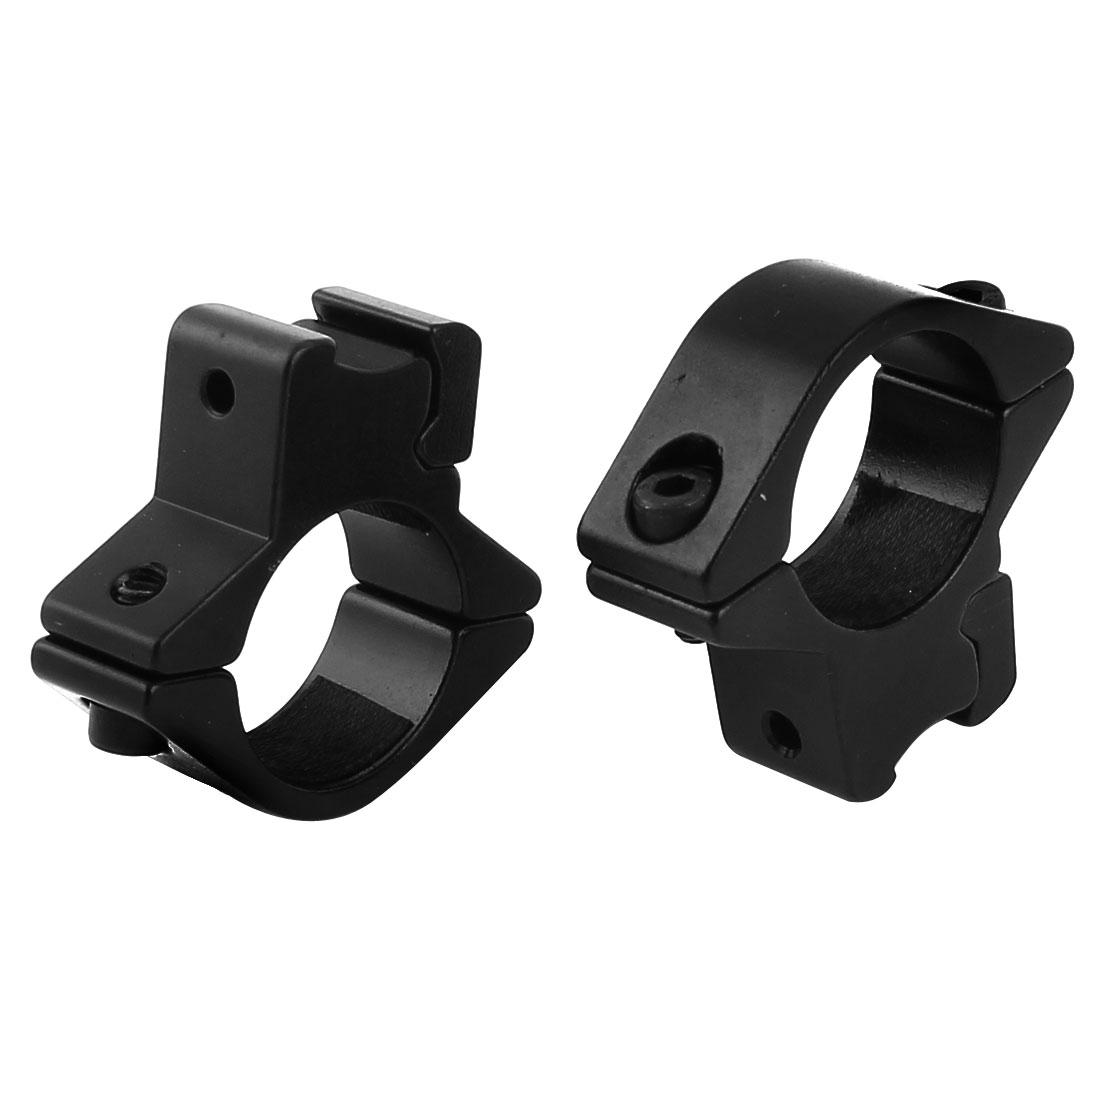 2 Pcs Gun Optical Sight Flashlight Mount Holder Aluminum Clip Clamp Black